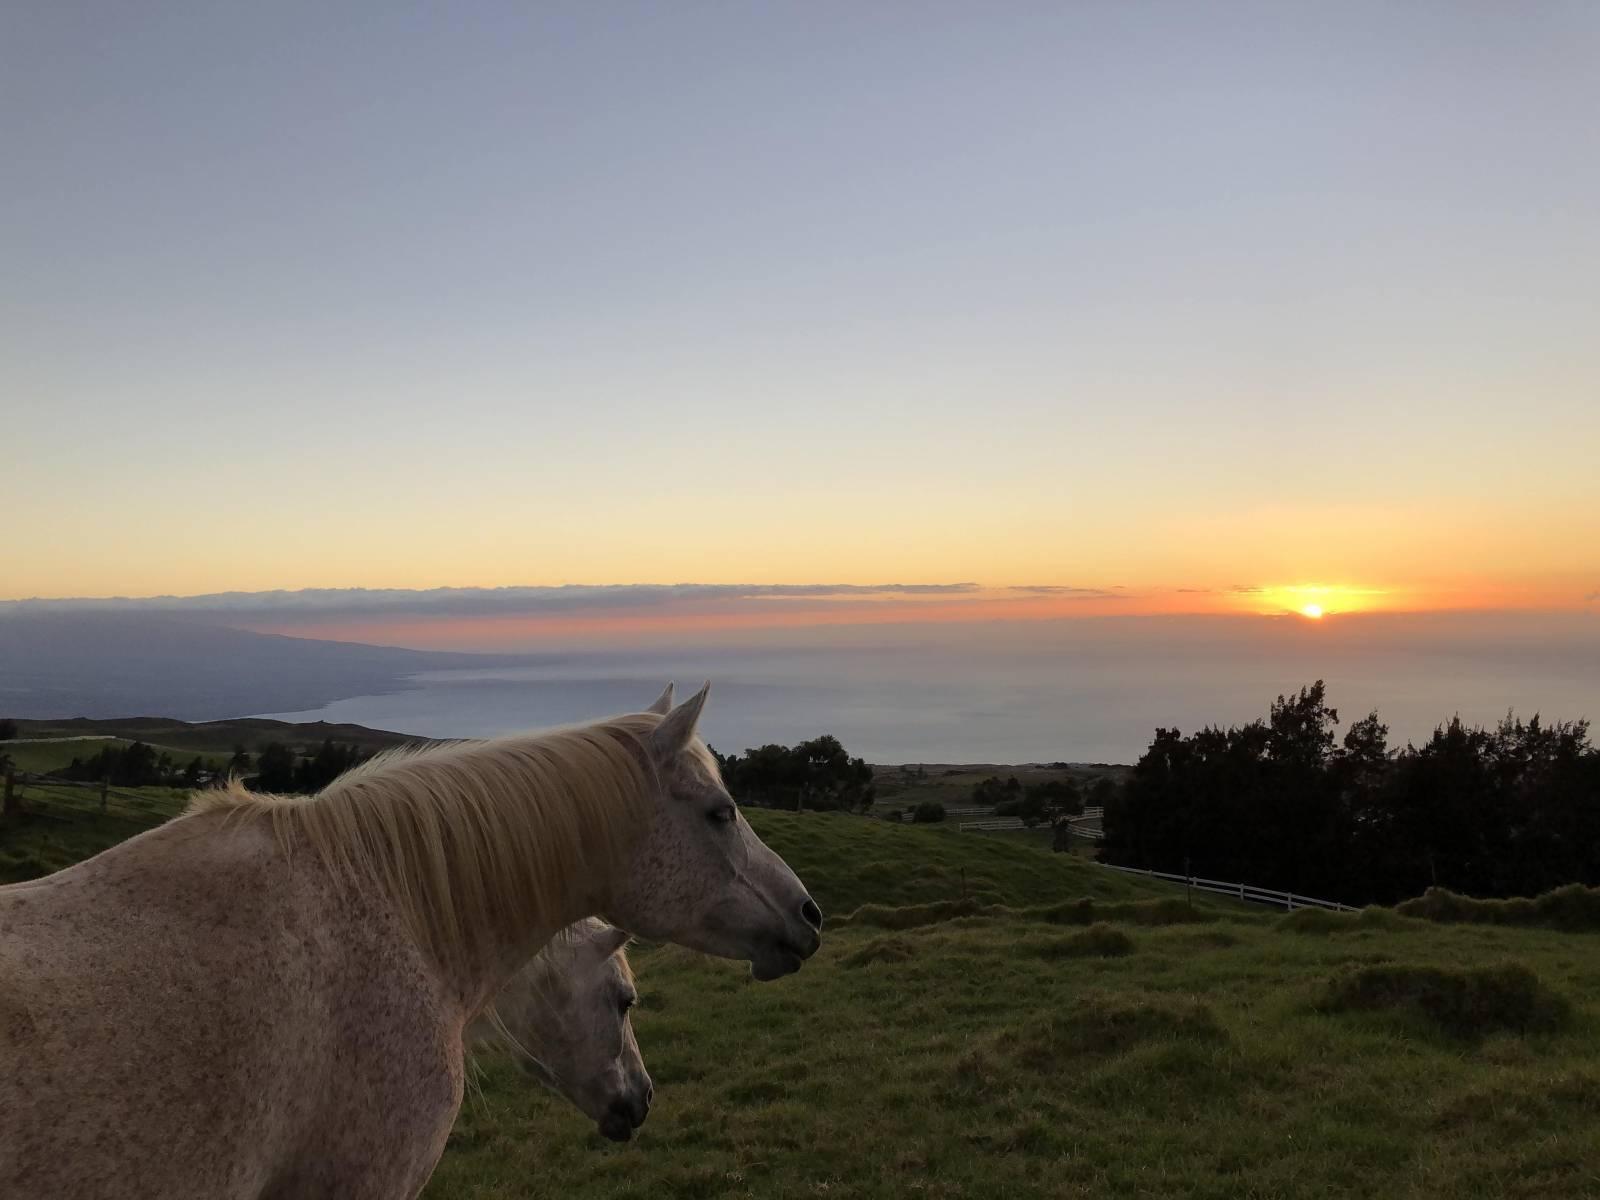 Horses at sunset in Kohala Ranch Summit